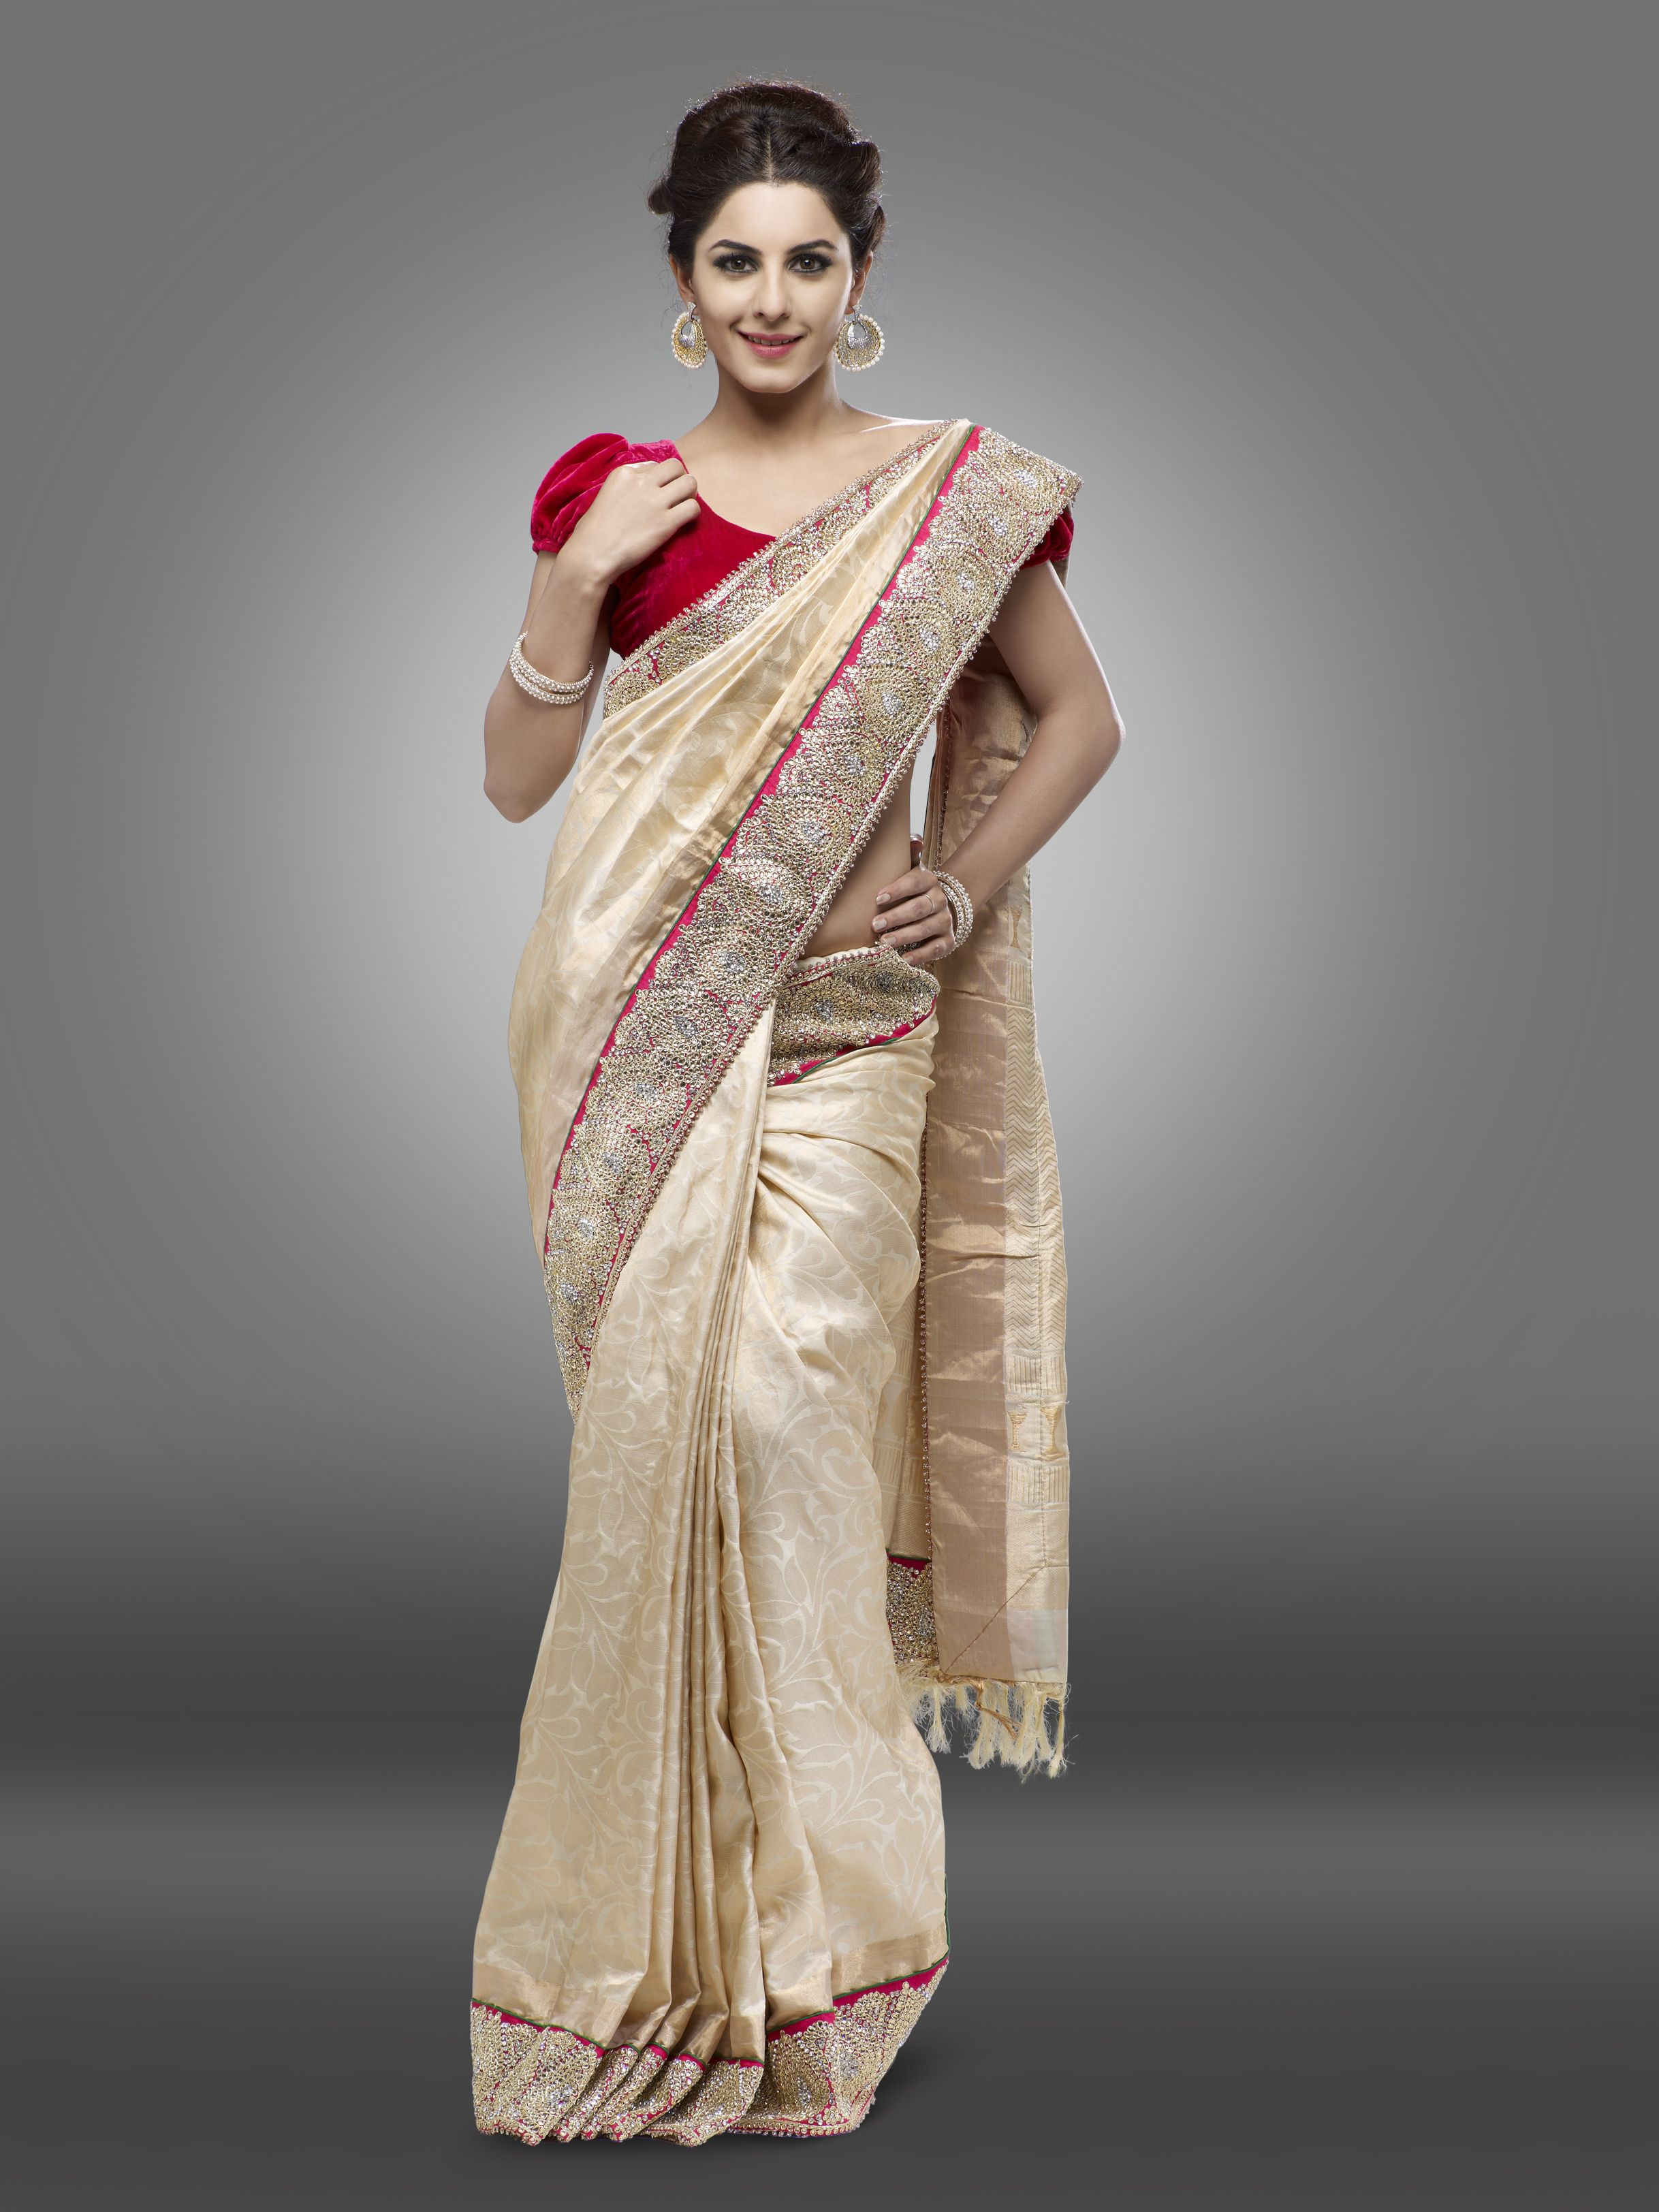 Pure Banarasi Saree In Offwhite With An Uppada Style Zari